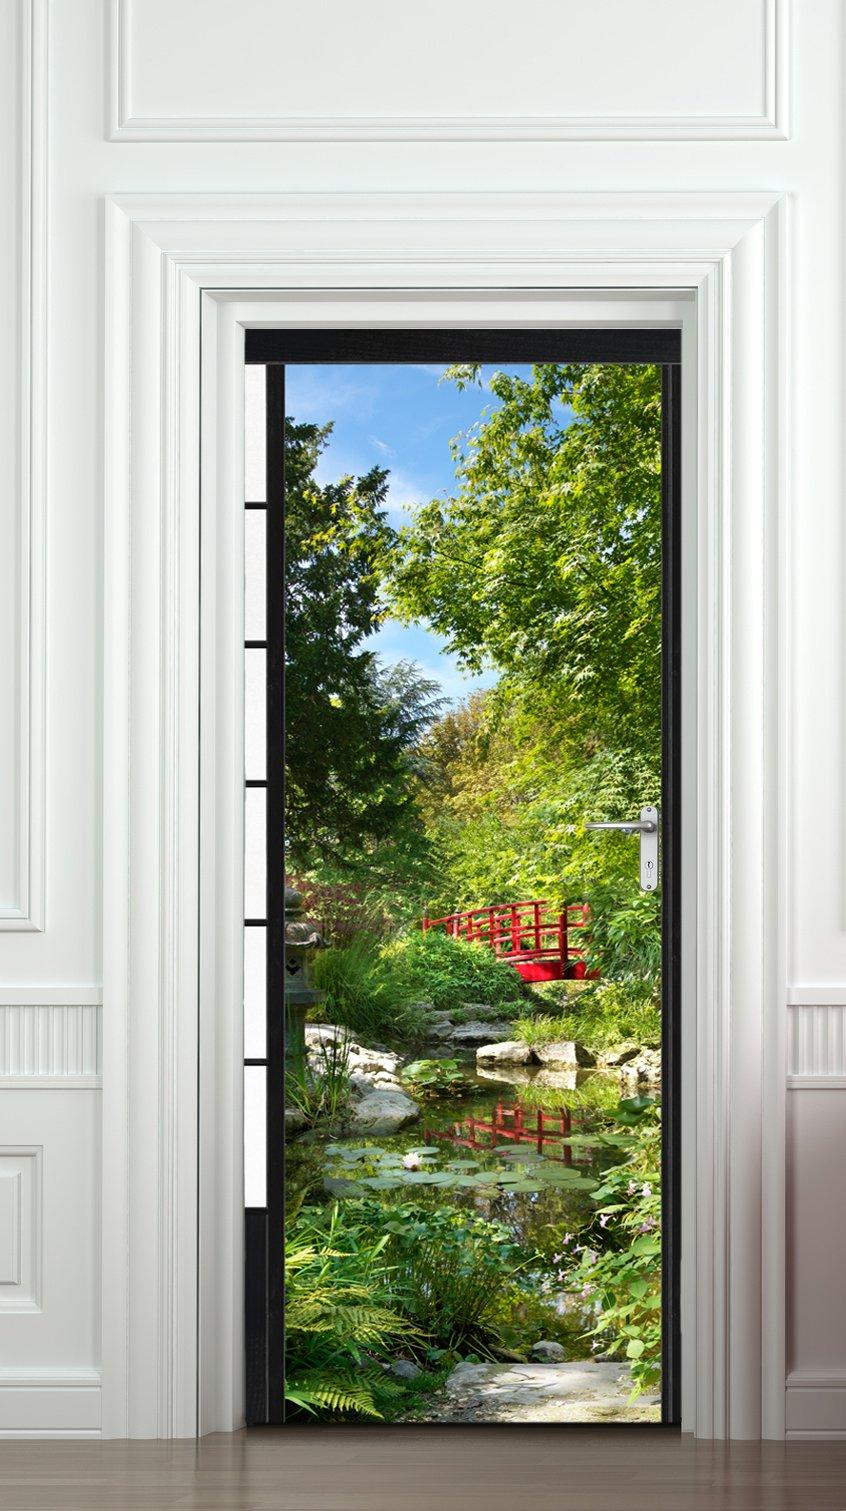 plage 141020 osaka sticker pour porte 204 cm x 83 cm inspid co. Black Bedroom Furniture Sets. Home Design Ideas